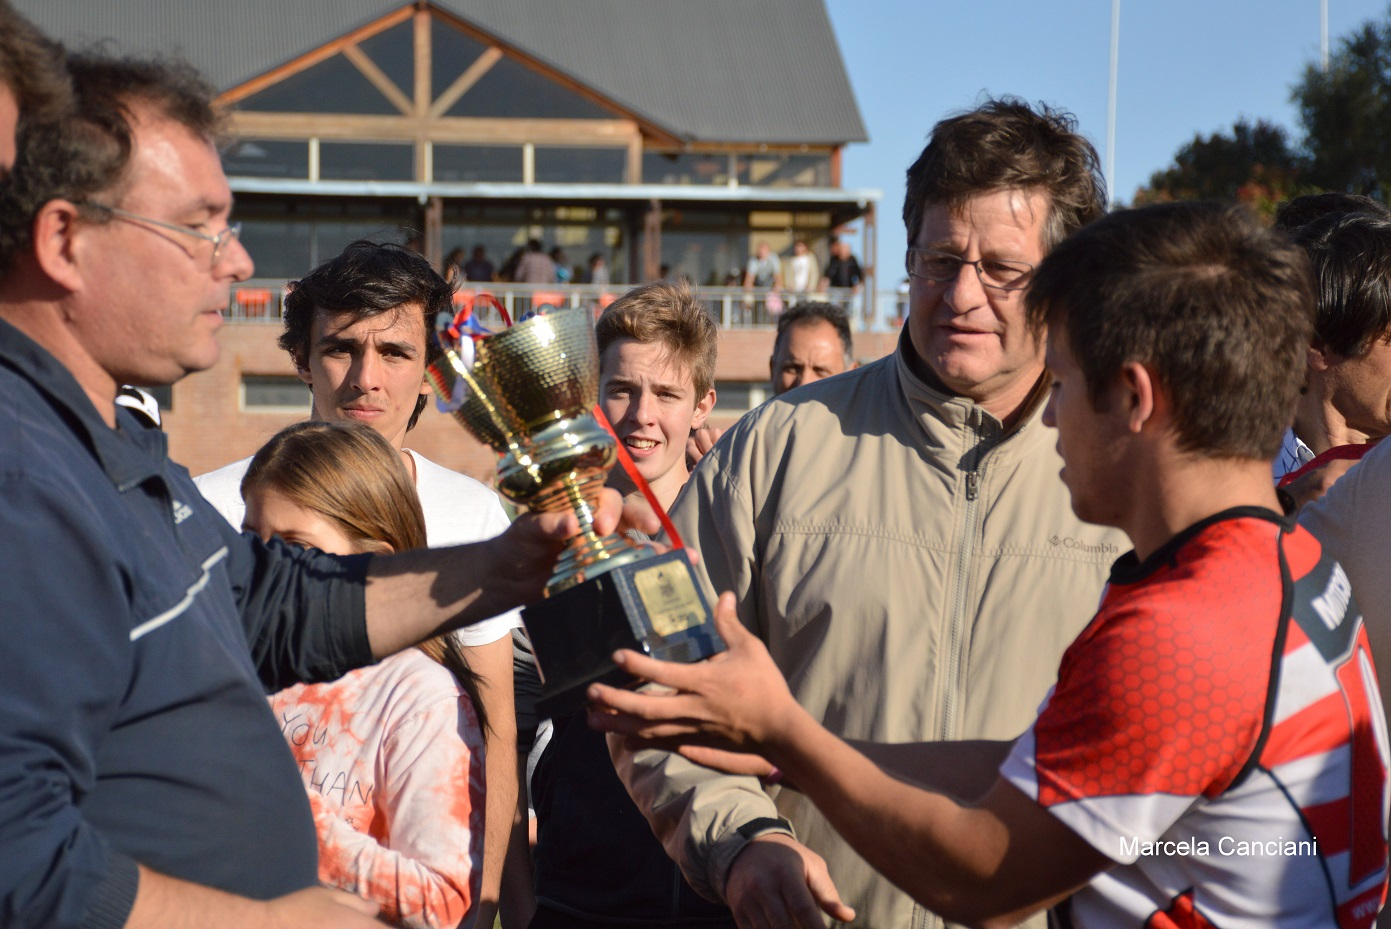 Entrega de la Copa - Foto: Canciani